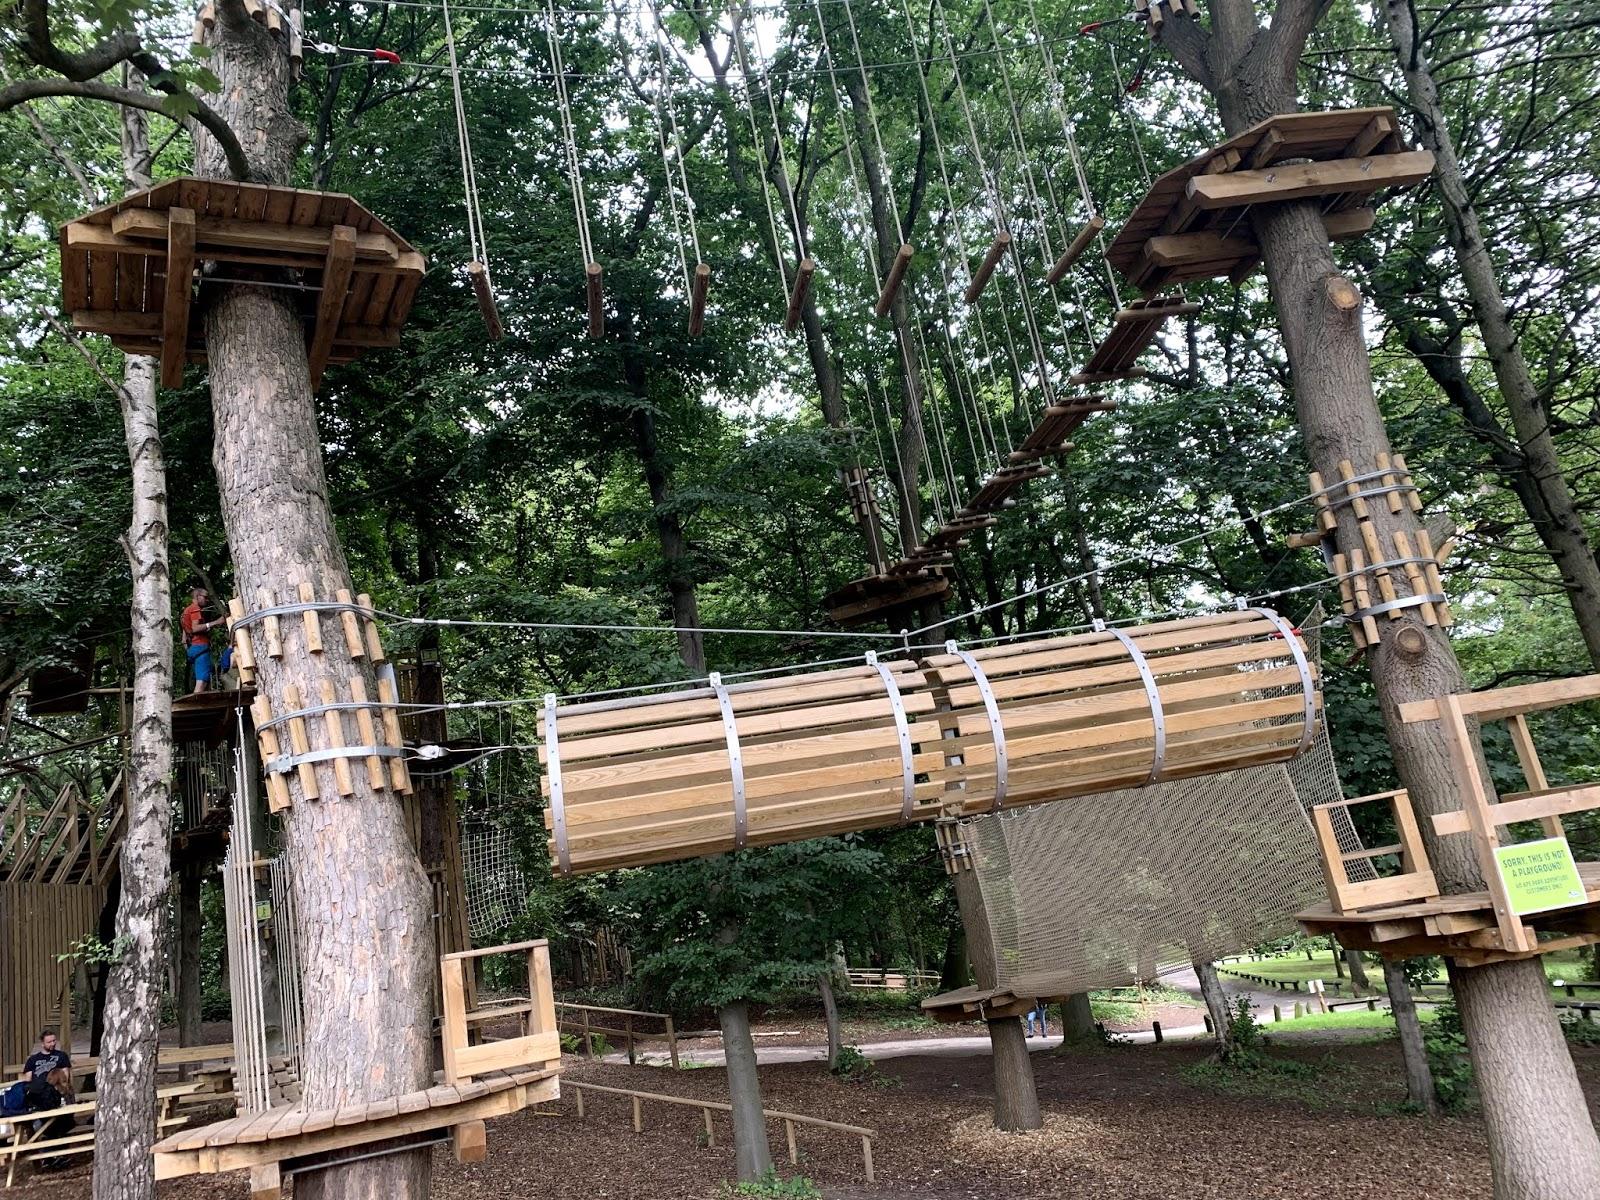 go-ape-treetop-adventure